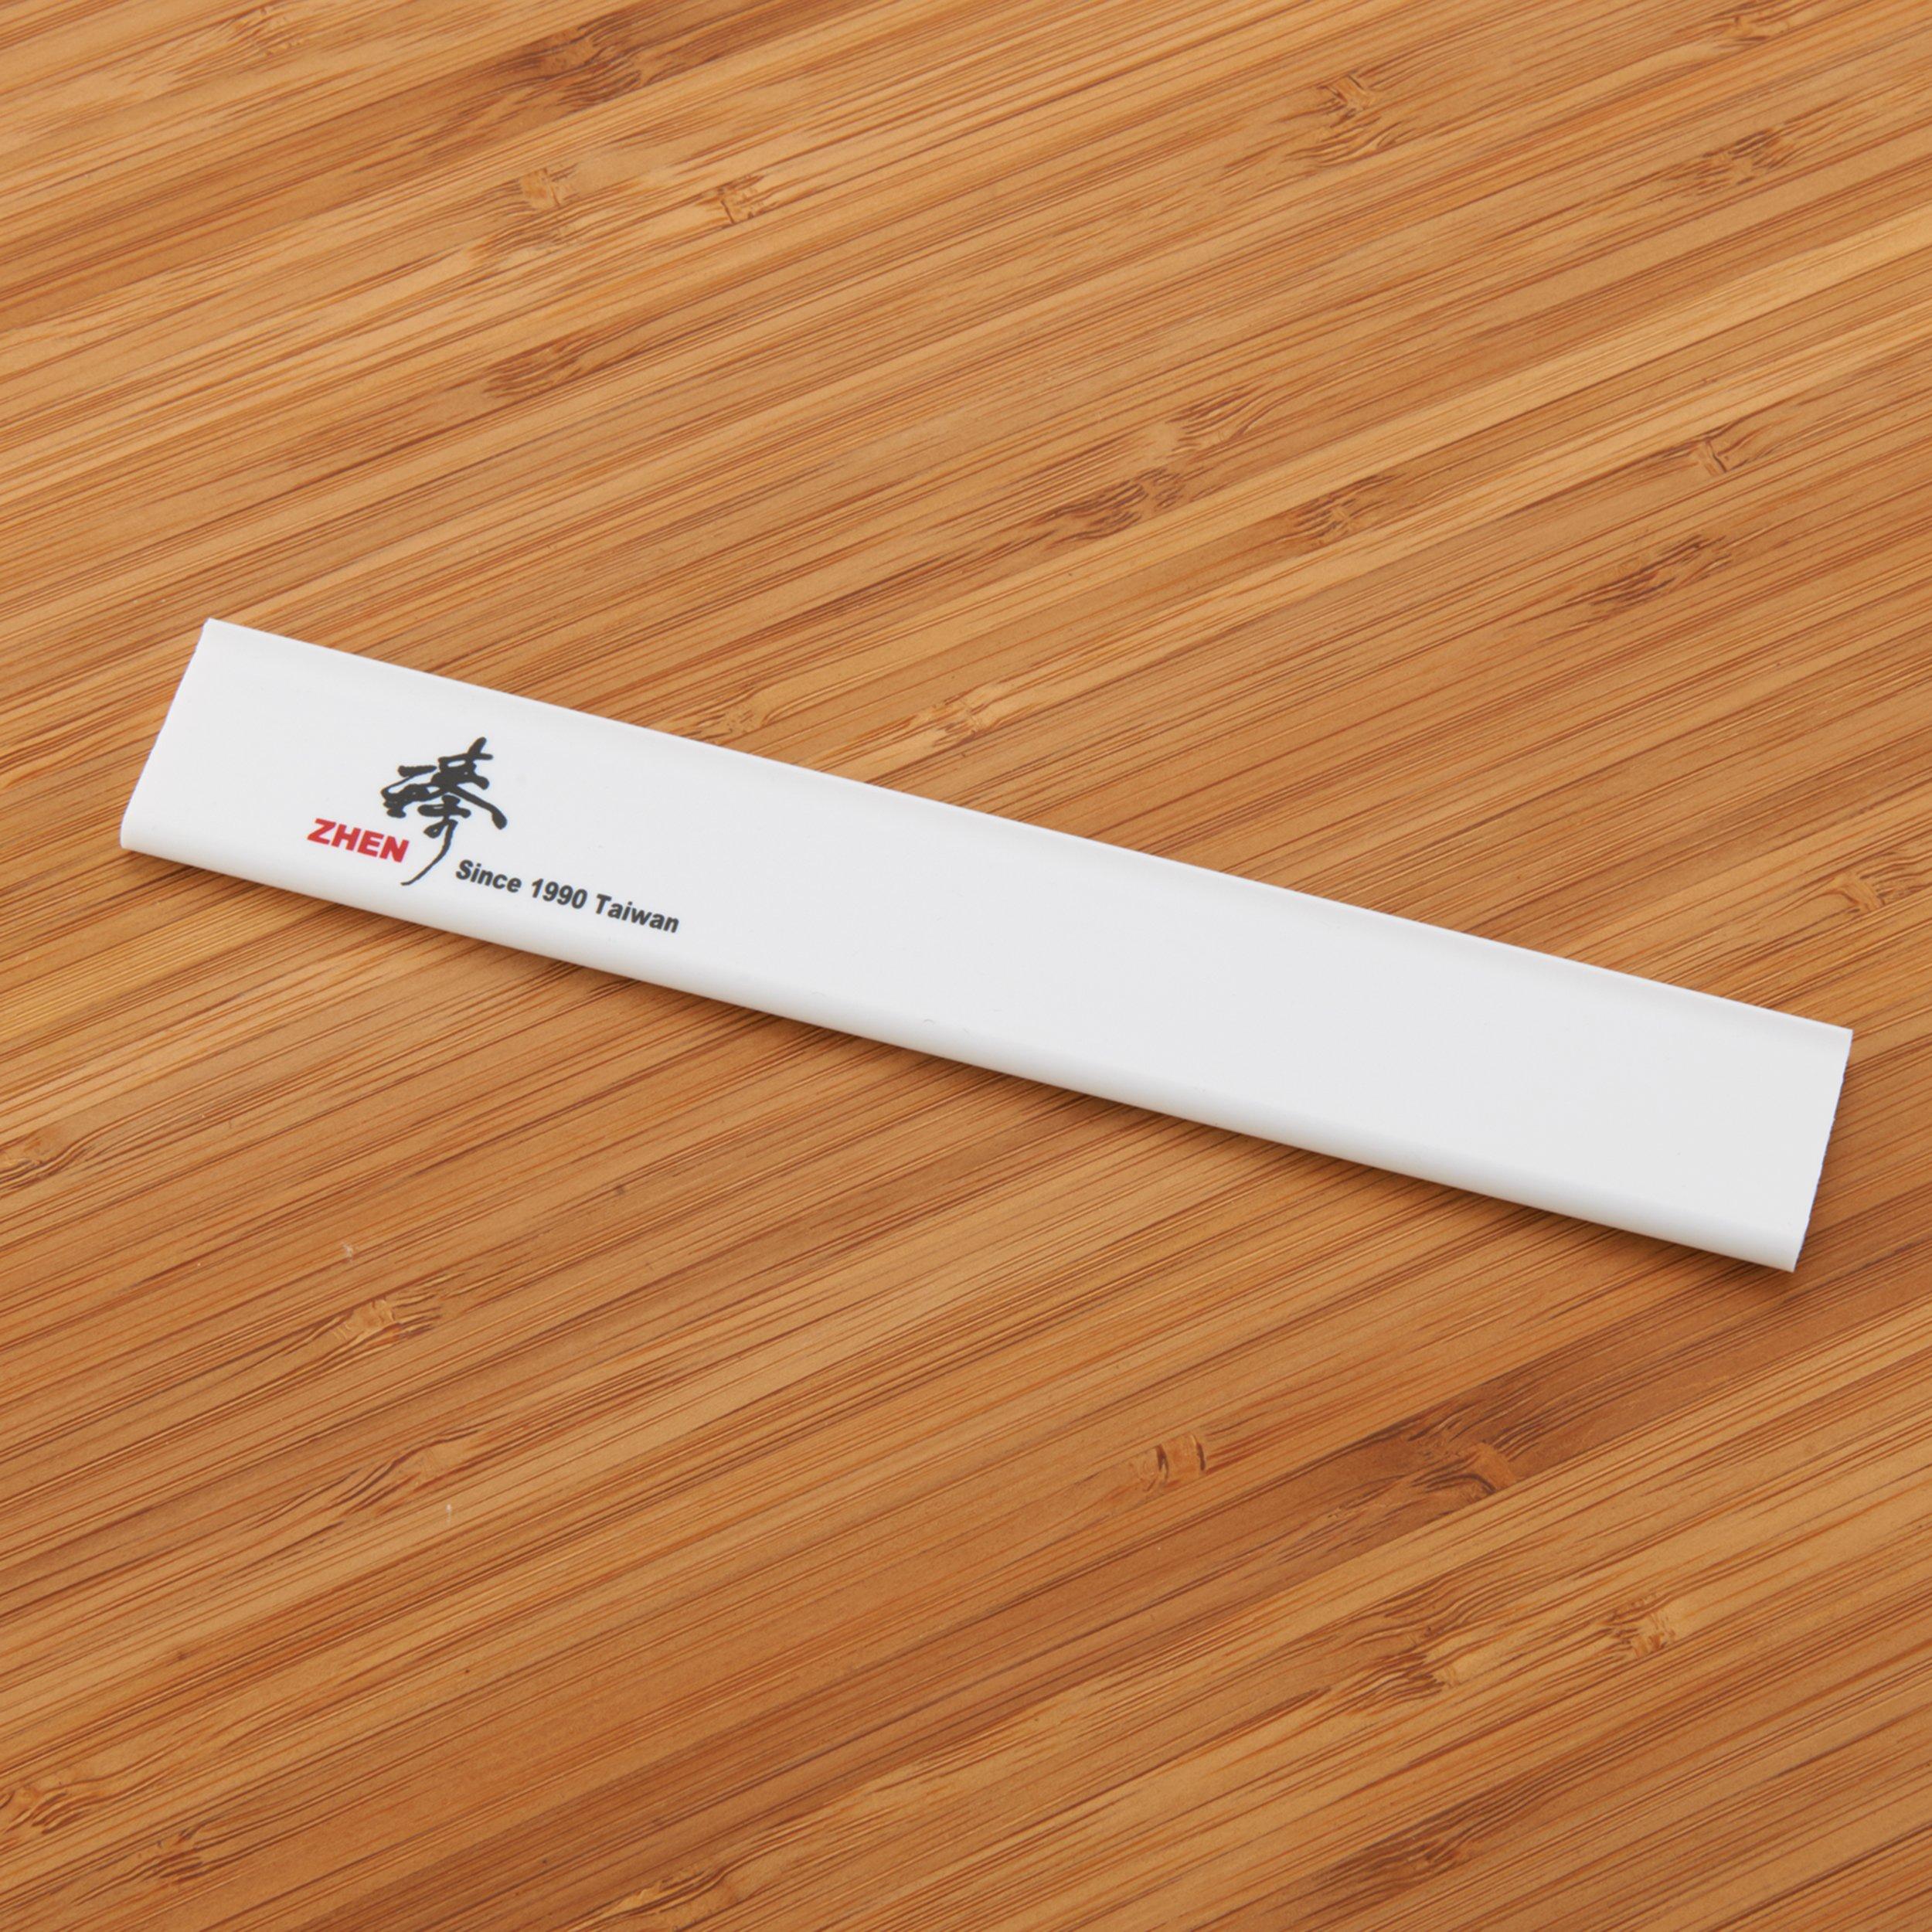 Zhen Kitchen Knife Cover 2.6 cm x 16 cm (1'' x 6-5/16'')